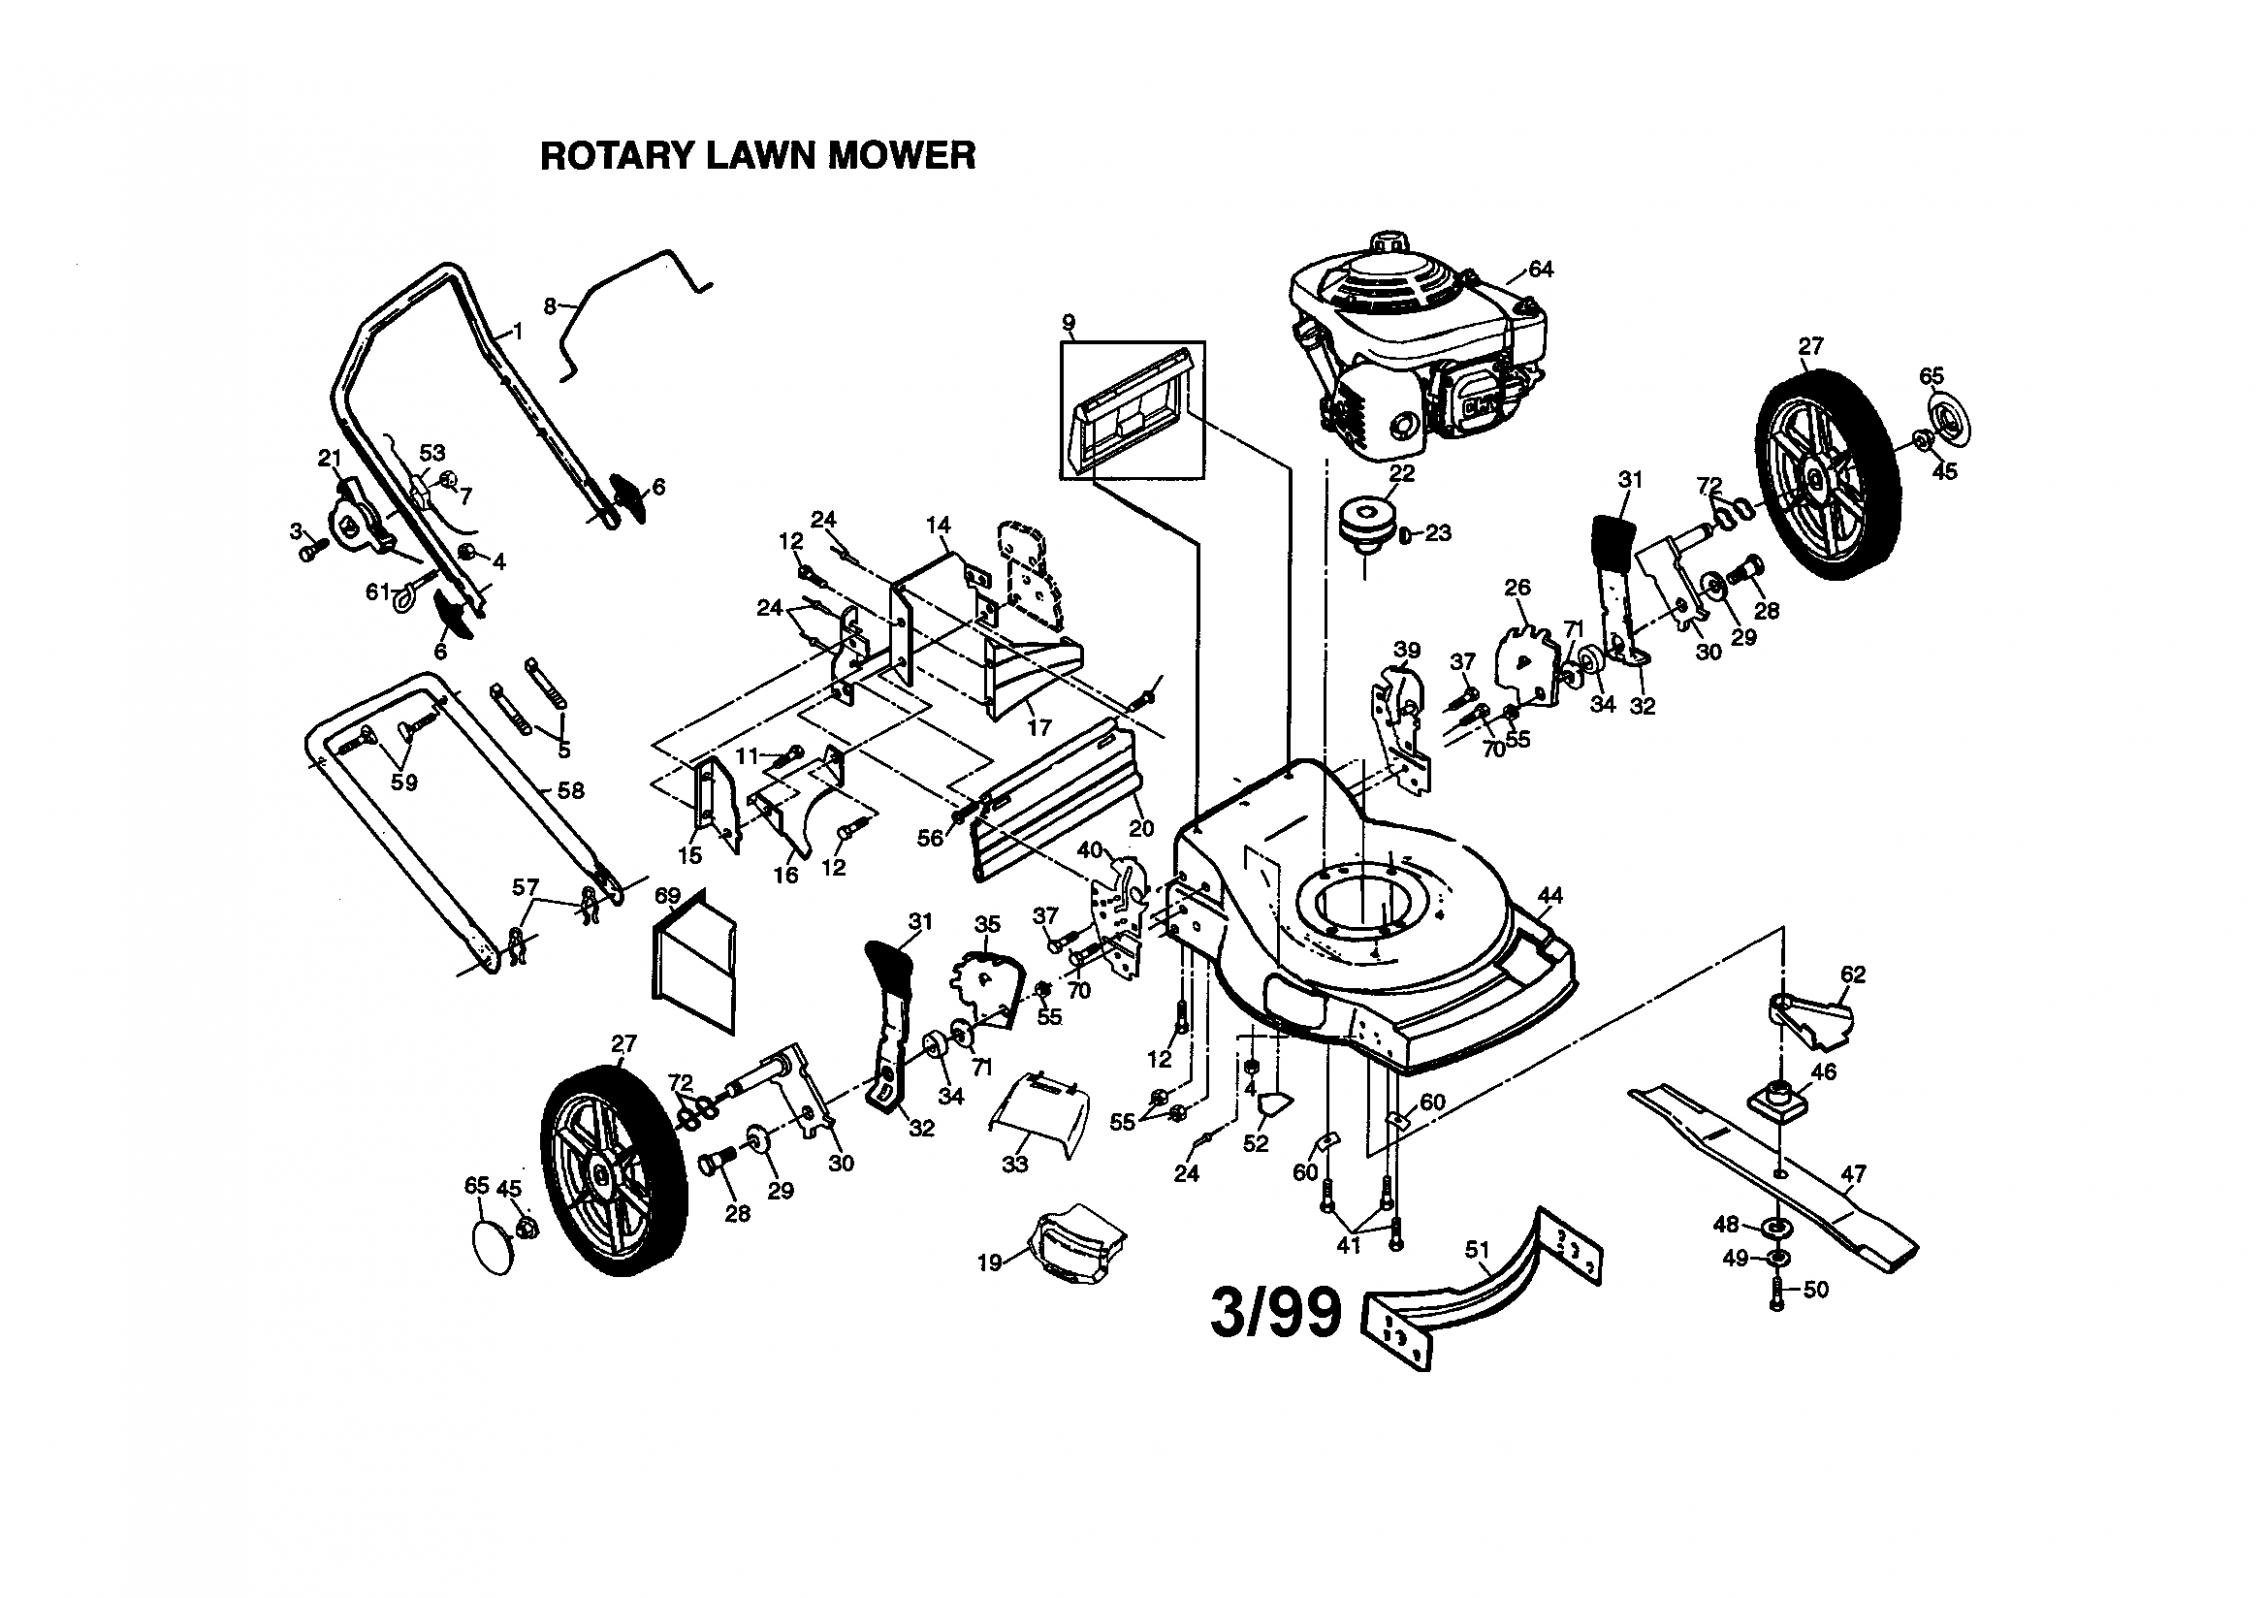 Honda Small Engine Parts Diagram di 2020